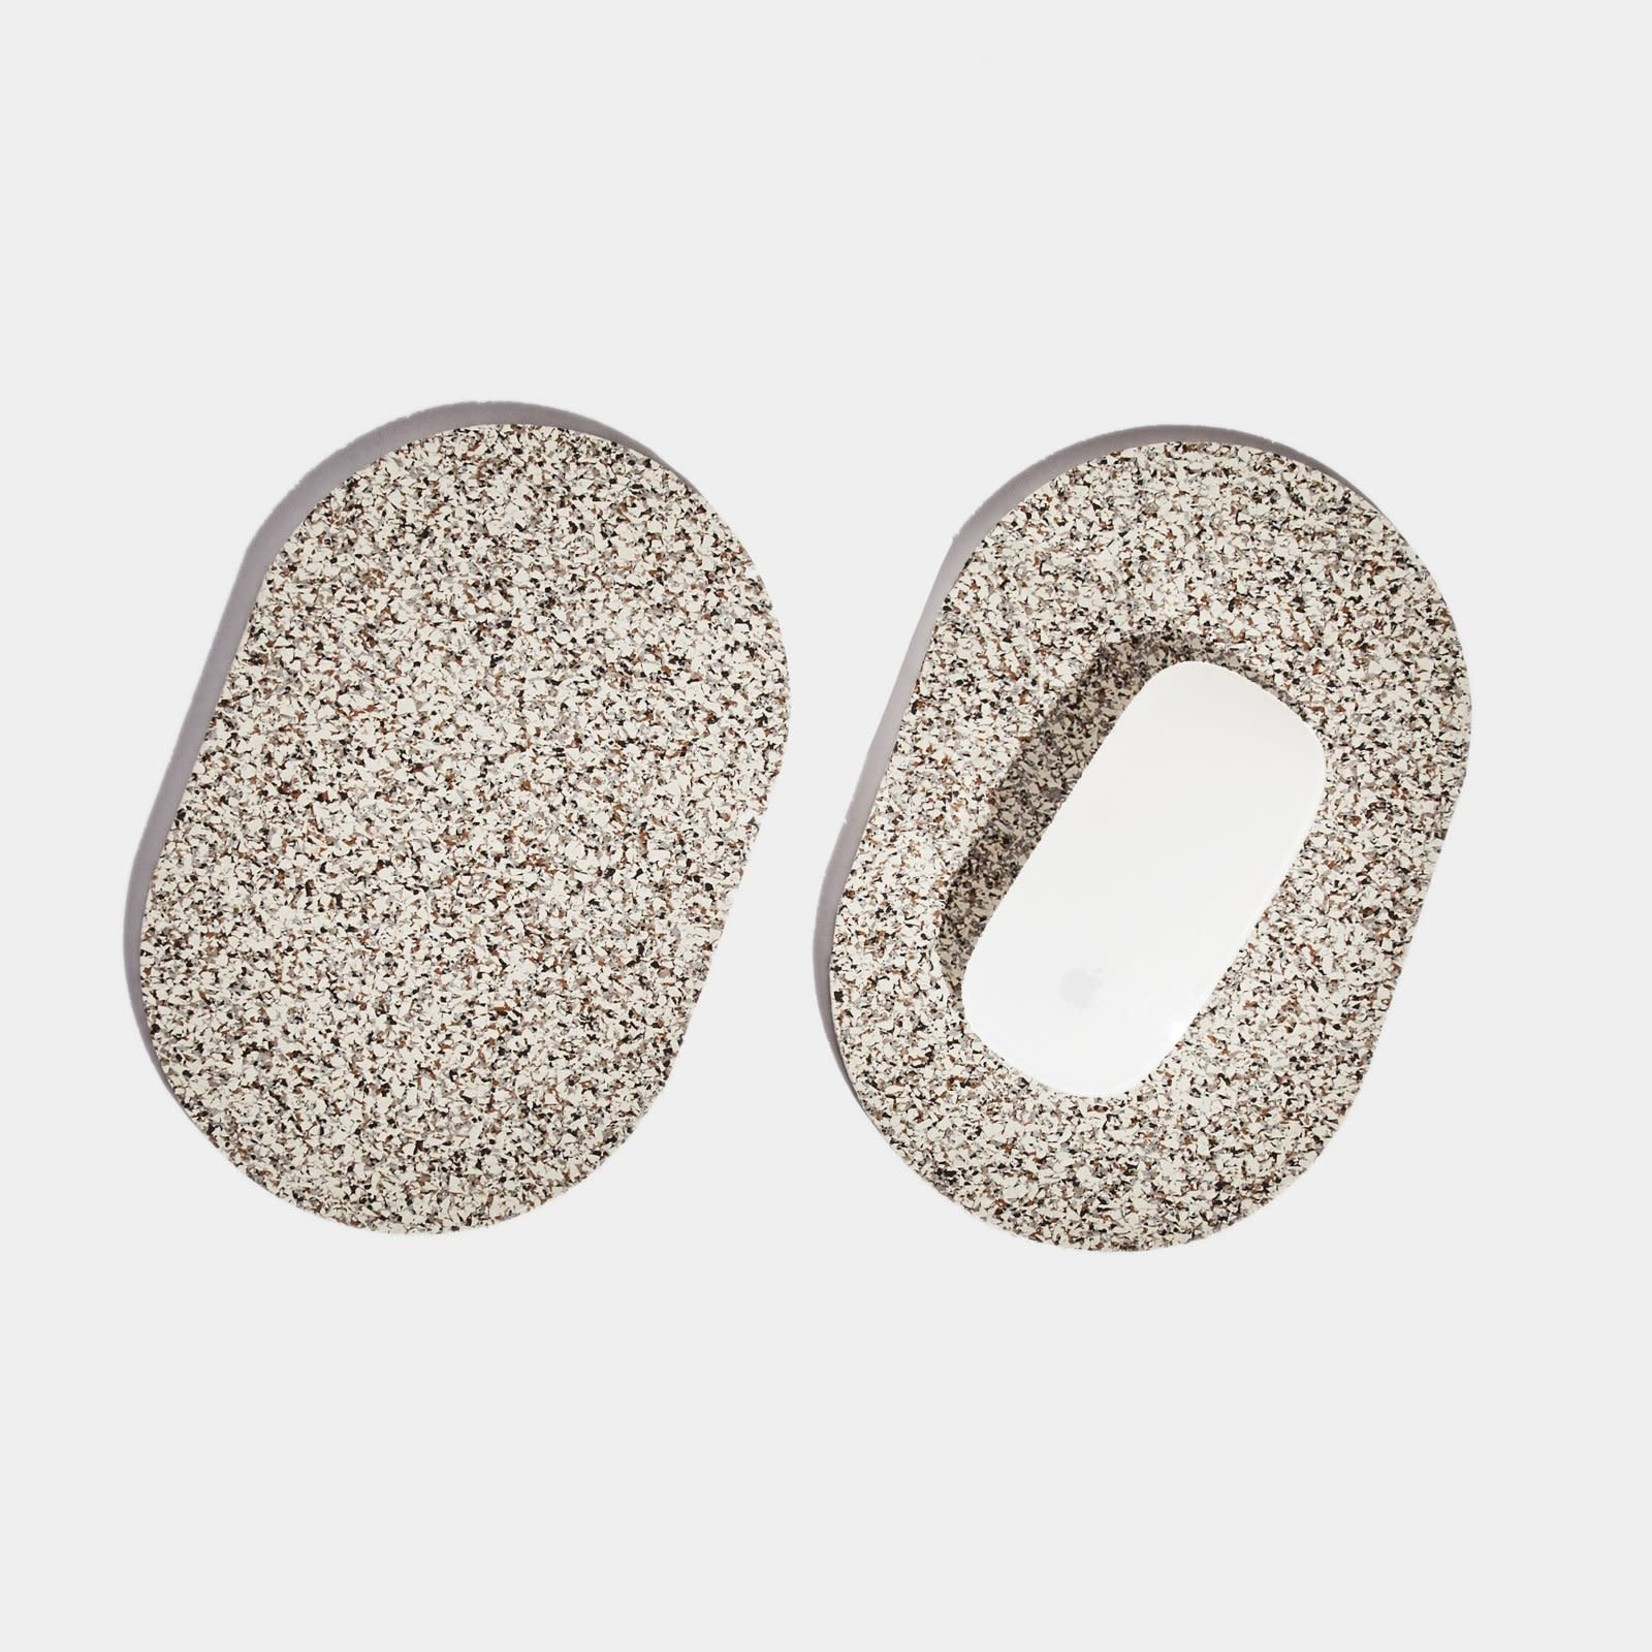 Slash Objects Slashed Objects Capsule Trivet Duo Sand